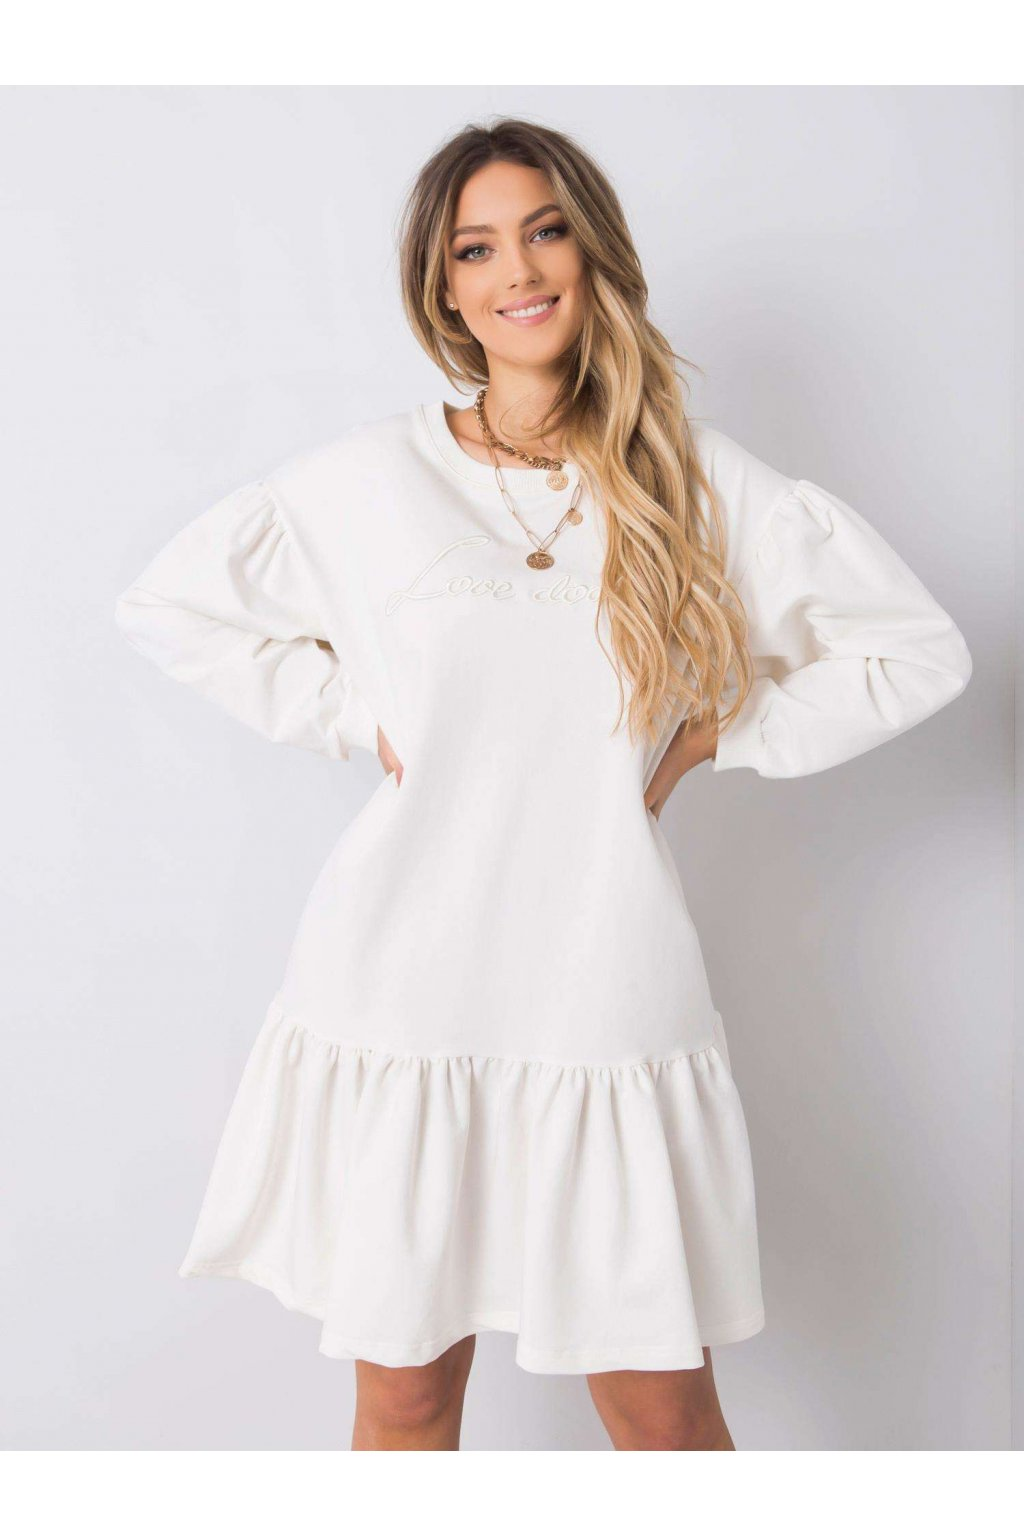 pol pl Biala sukienka z falbana Janelle 363385 1